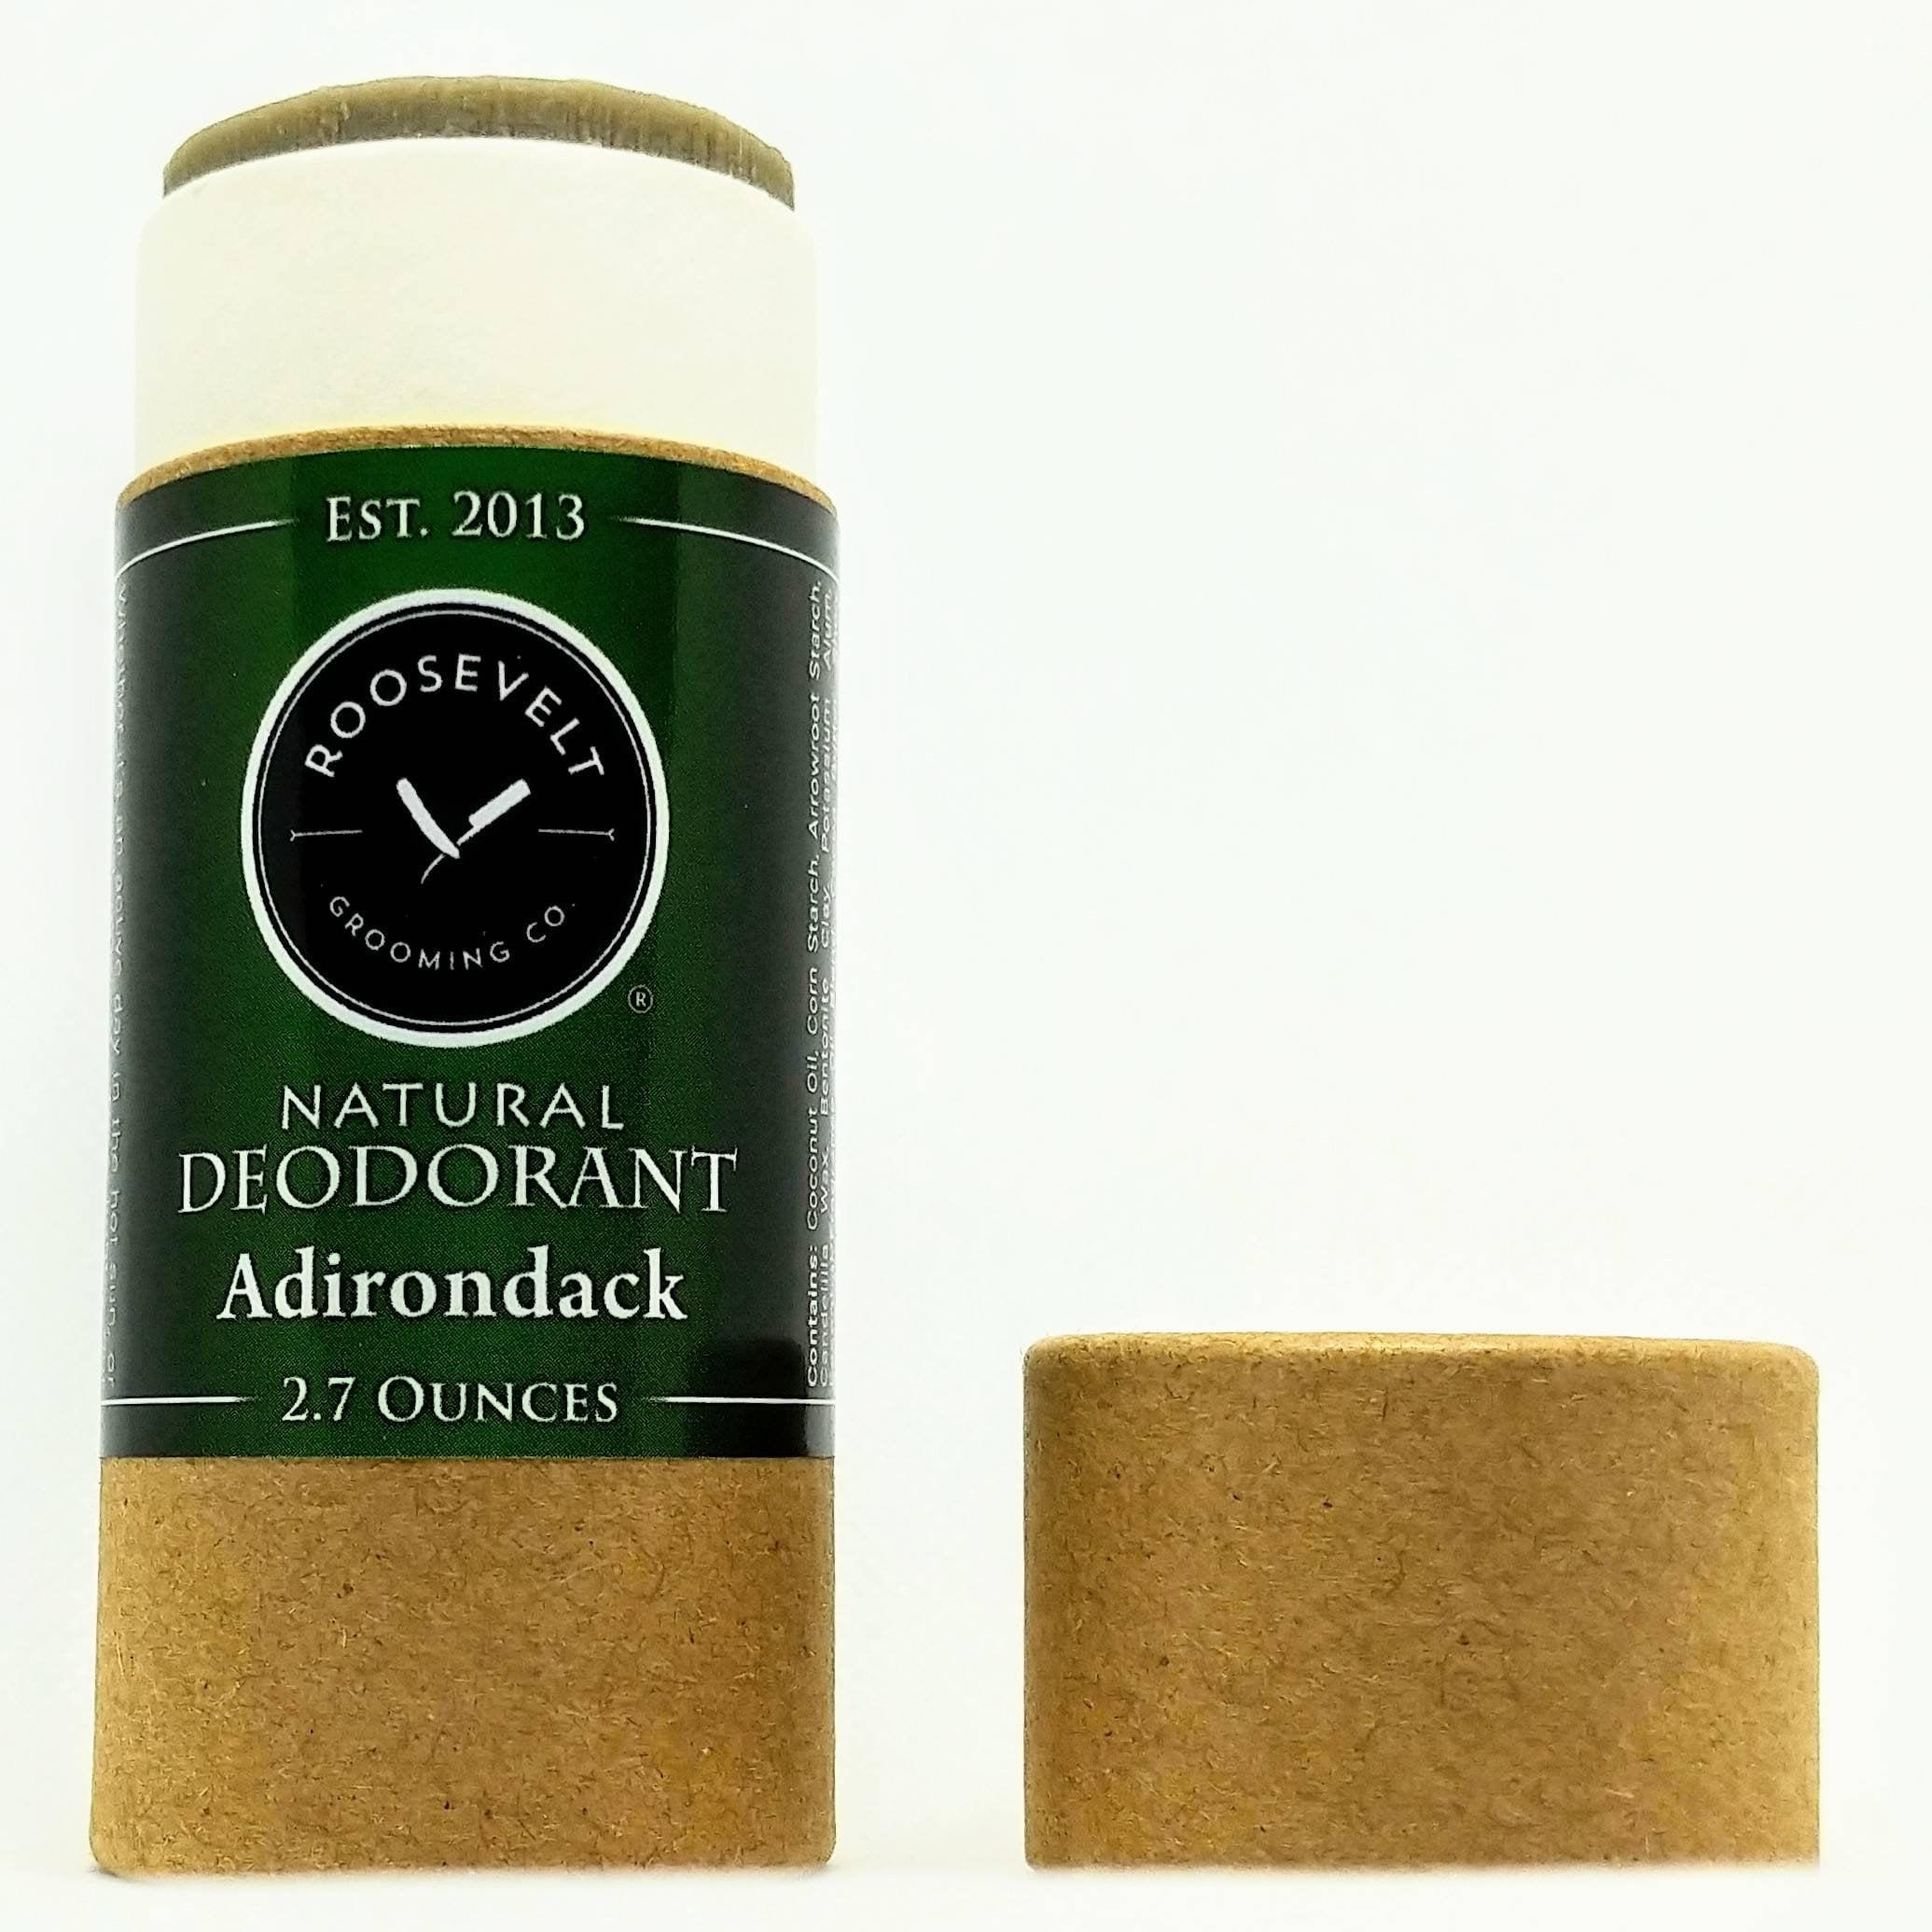 Natural Deodorant Stick w/o Baking Soda or Parabens (That